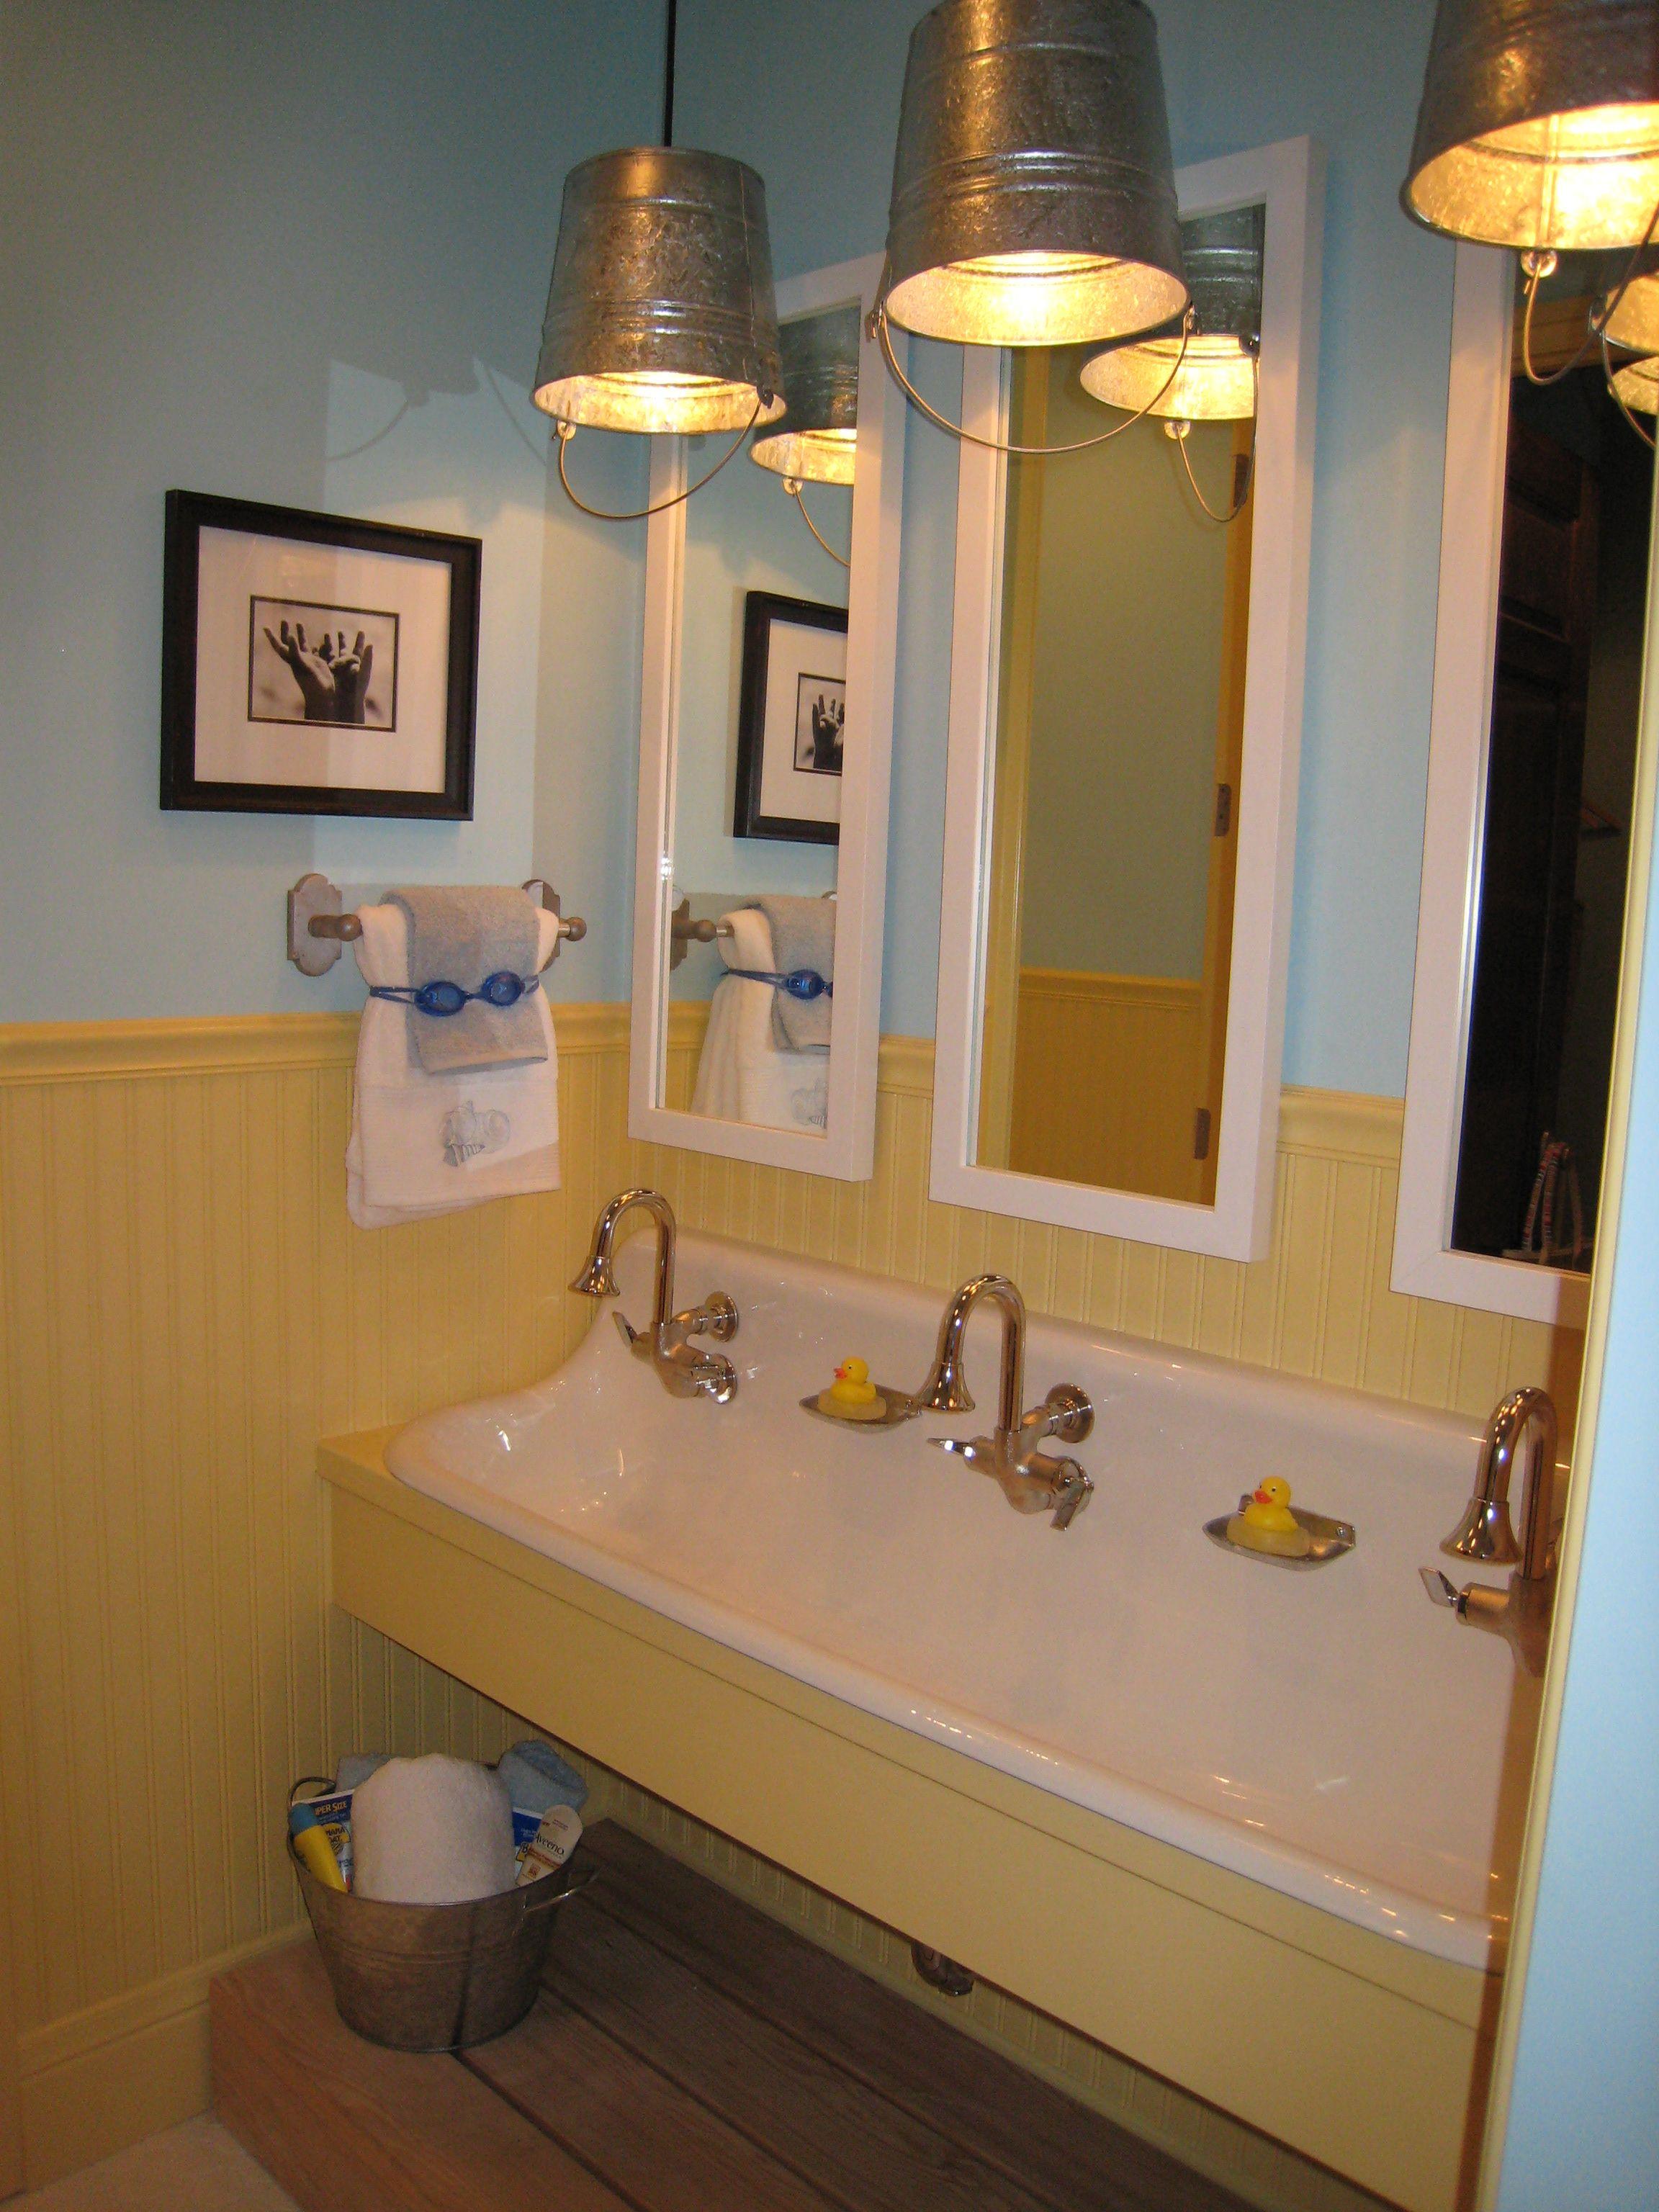 kidsu0027 jack u0026 jill bathroom trough sink with multiple faucets bucket pendant lights